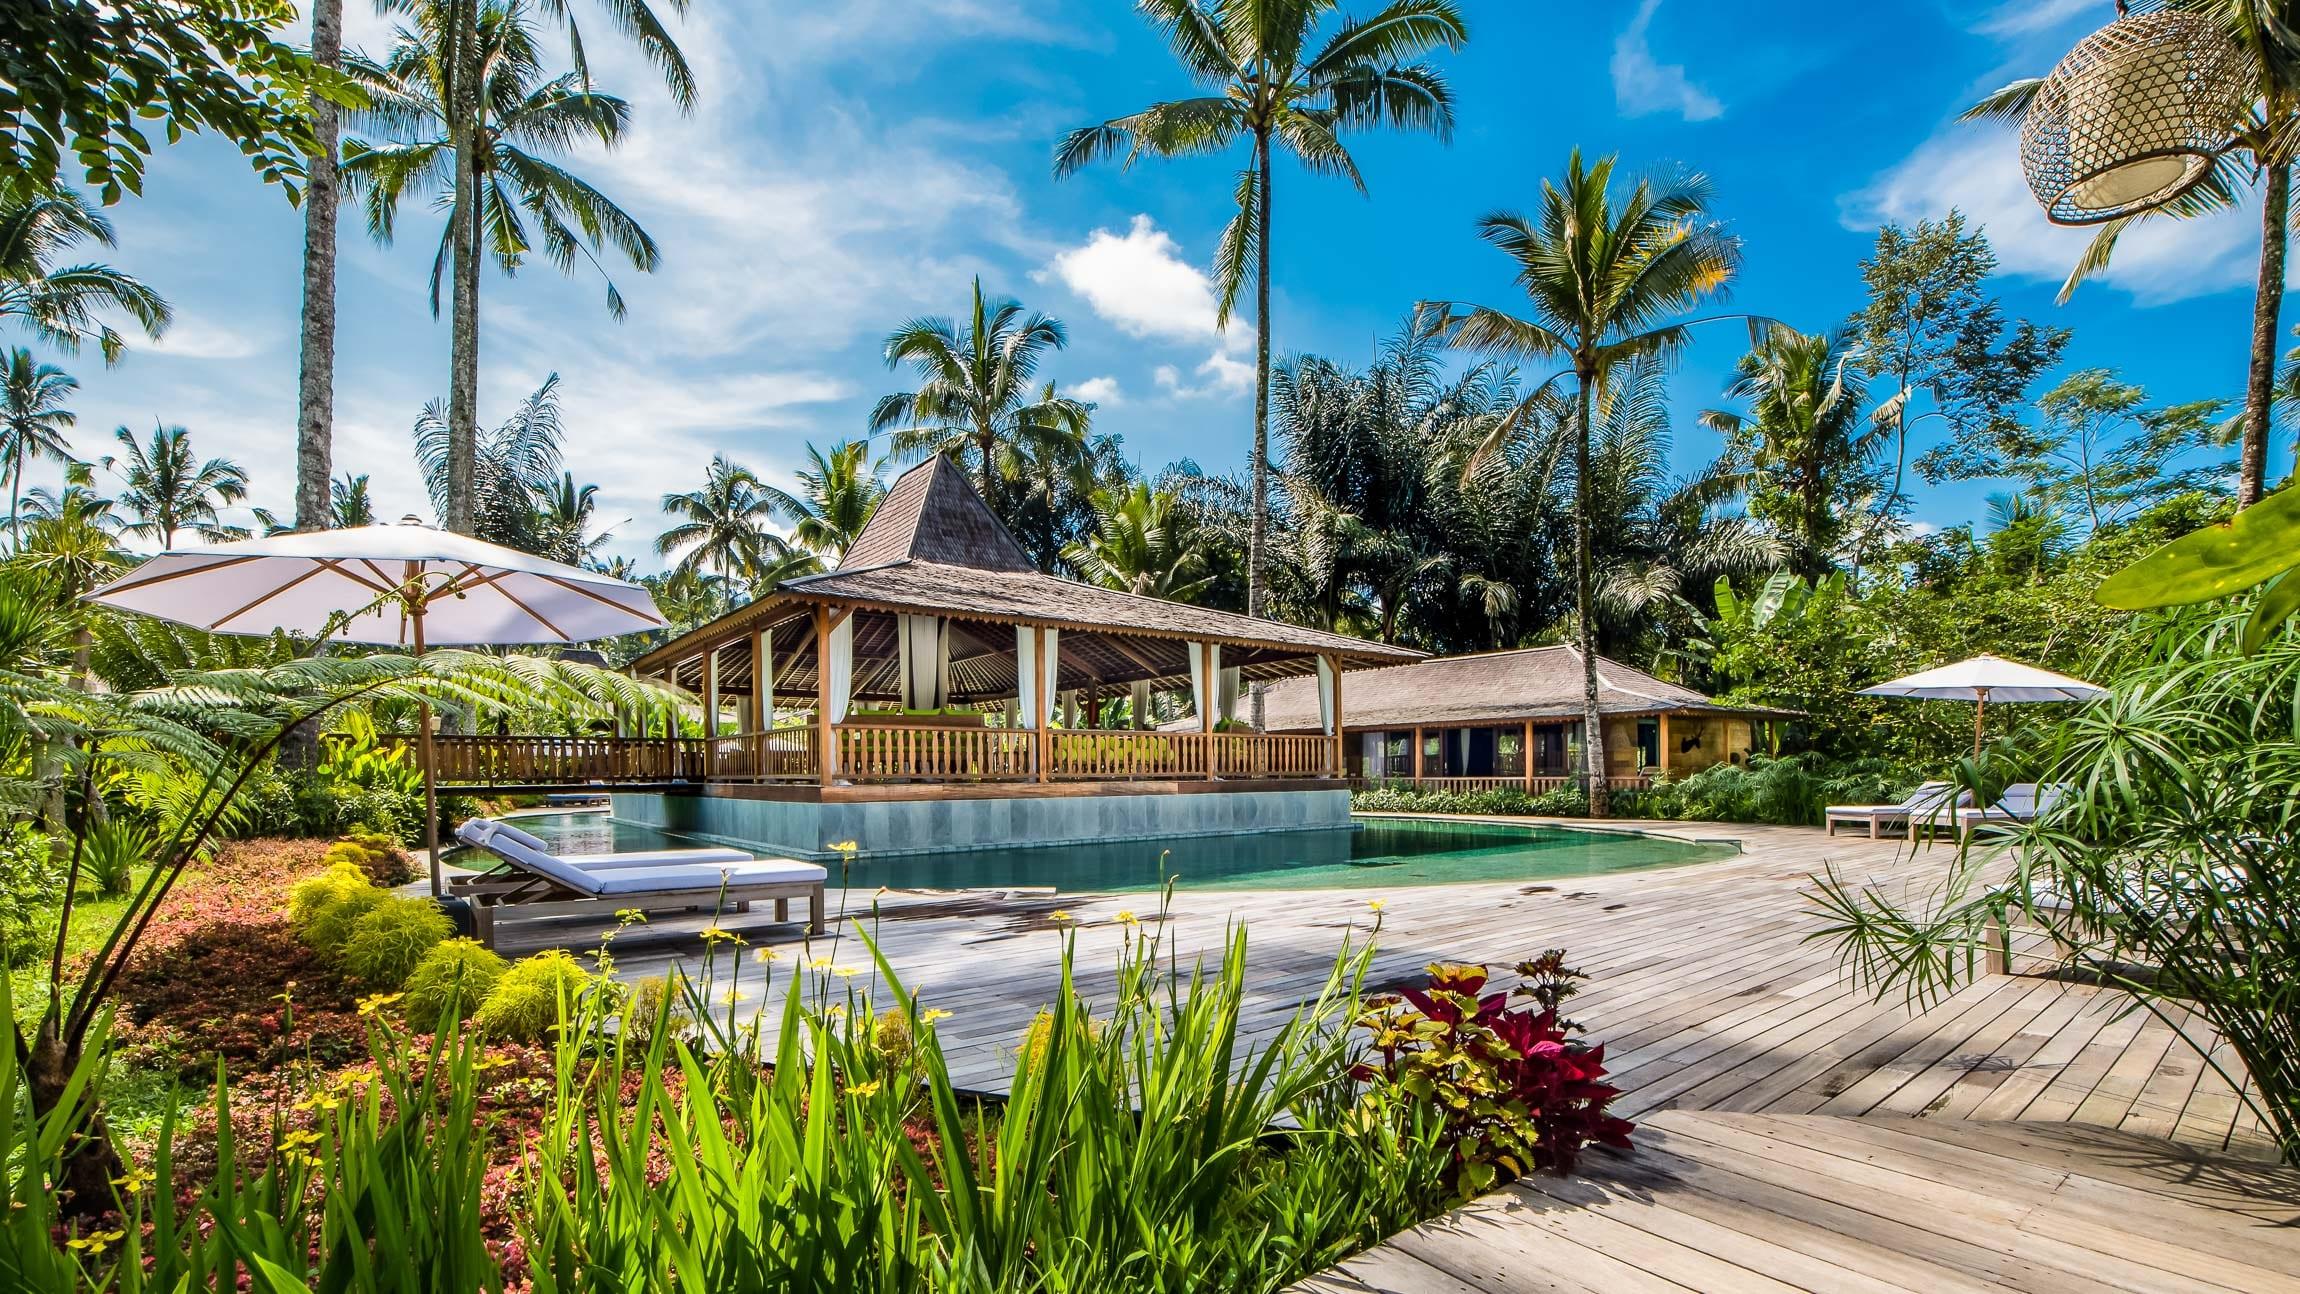 Villa Nag Shampa - Luxury Bali Villas